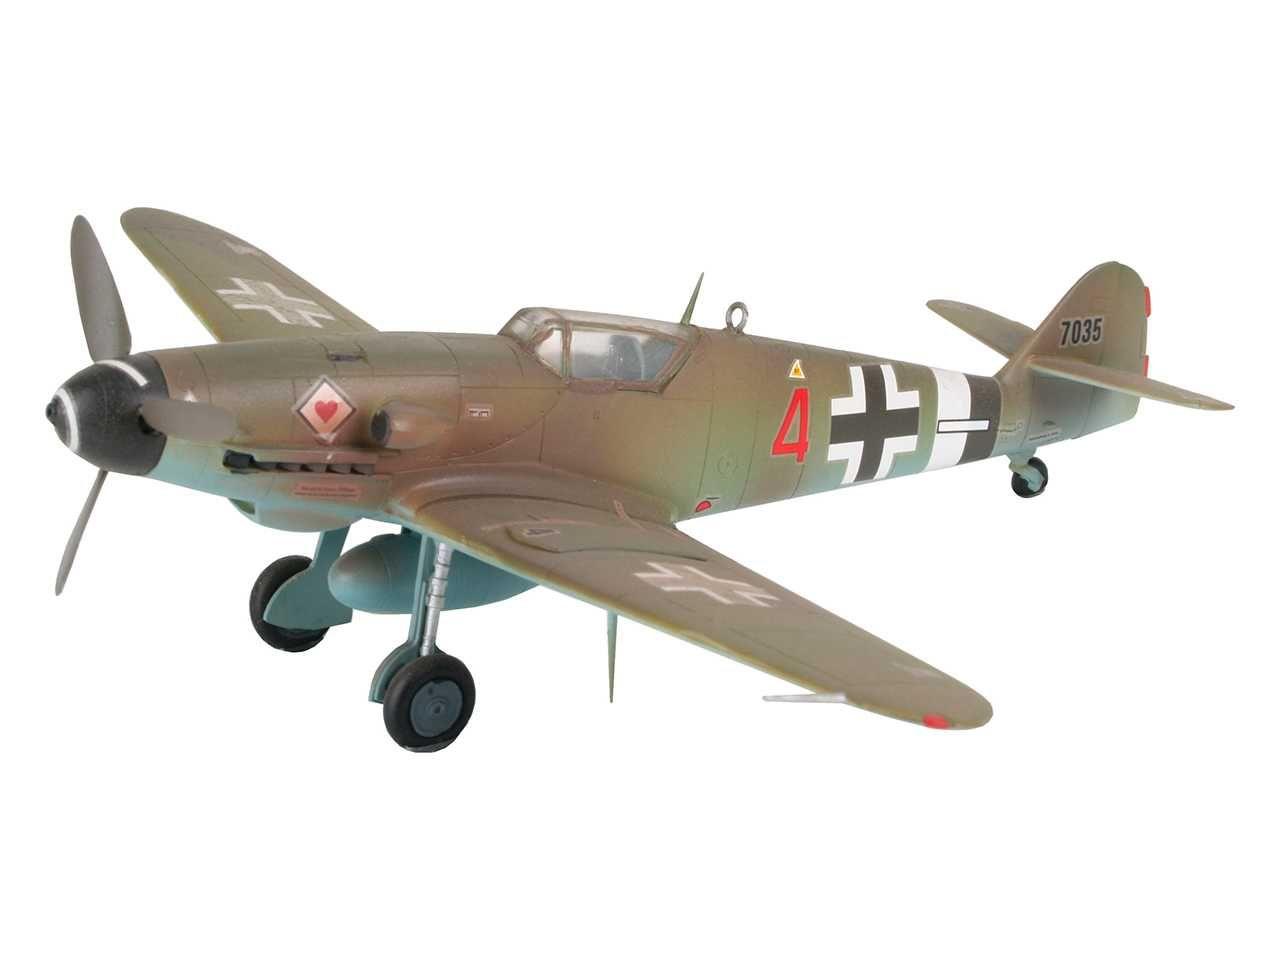 Plastic ModelKit letadlo 04160 - Messerschmitt Bf 109 G-10 (1:72) Plastikové modely